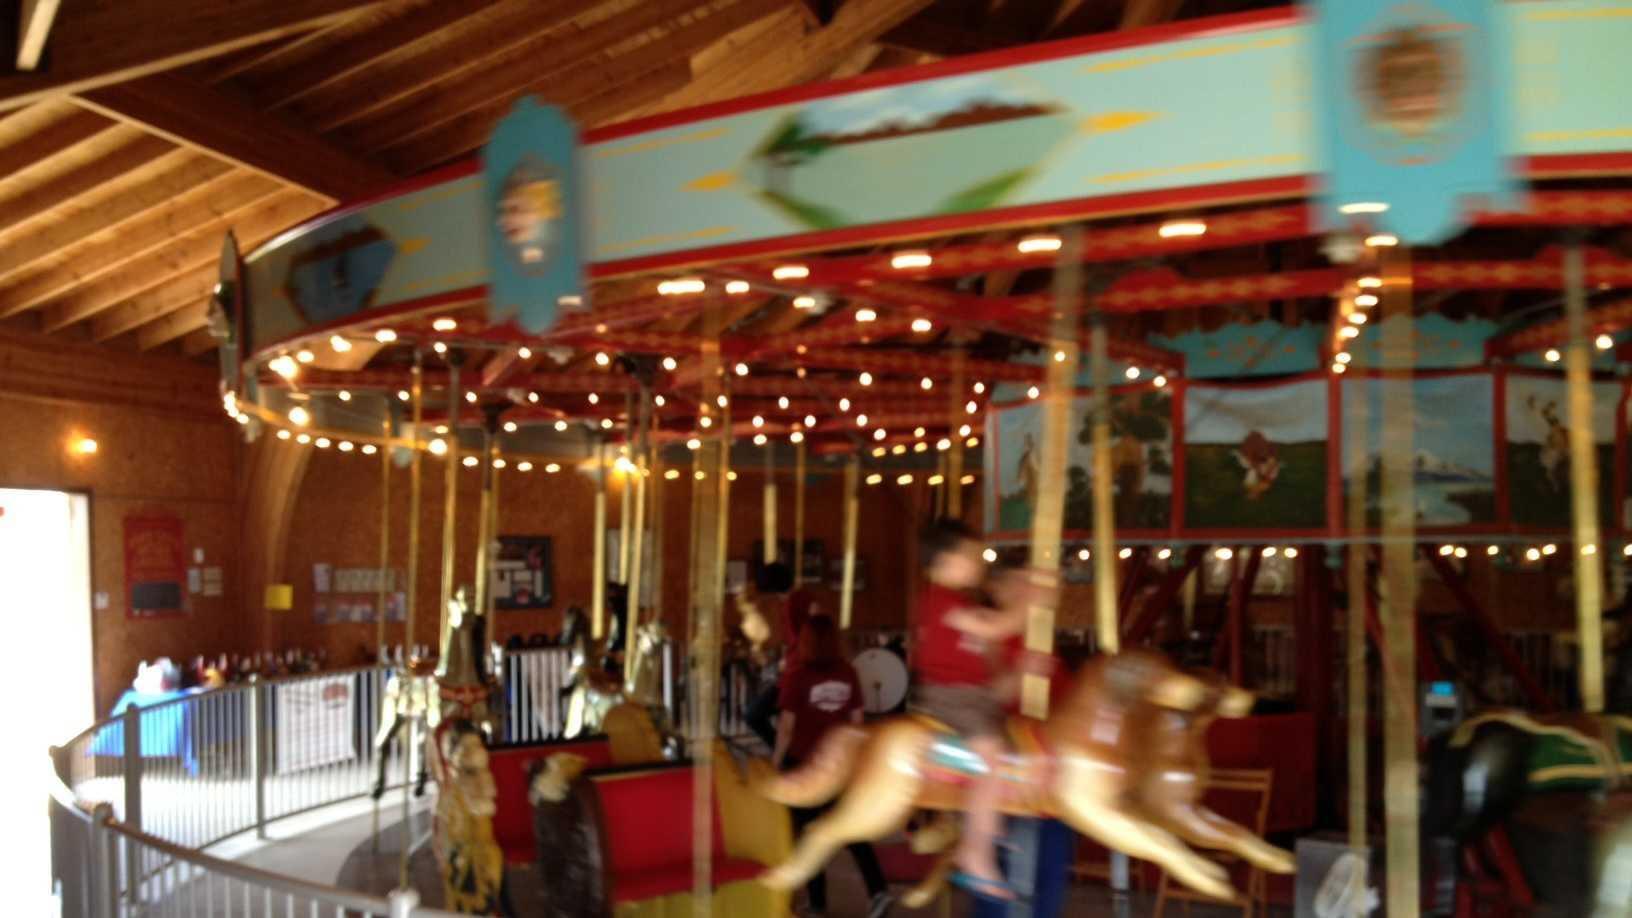 carousel 1.JPG